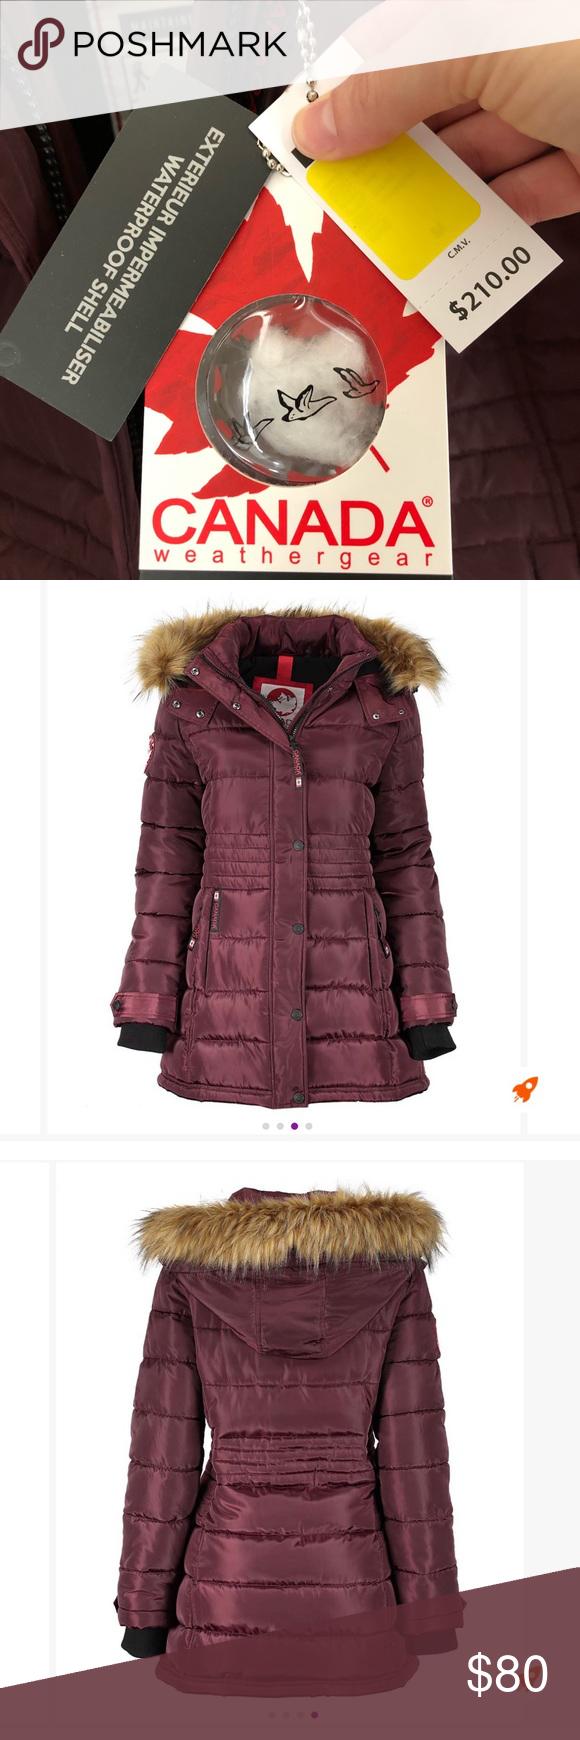 Canada Weather Gear Womens Winter Coat Beautiful Cranberry Colored Women S Winter Puffer Coat Faux Fur Trim Winter Coats Women Winter Women Winter Puffer Coat [ 1740 x 580 Pixel ]